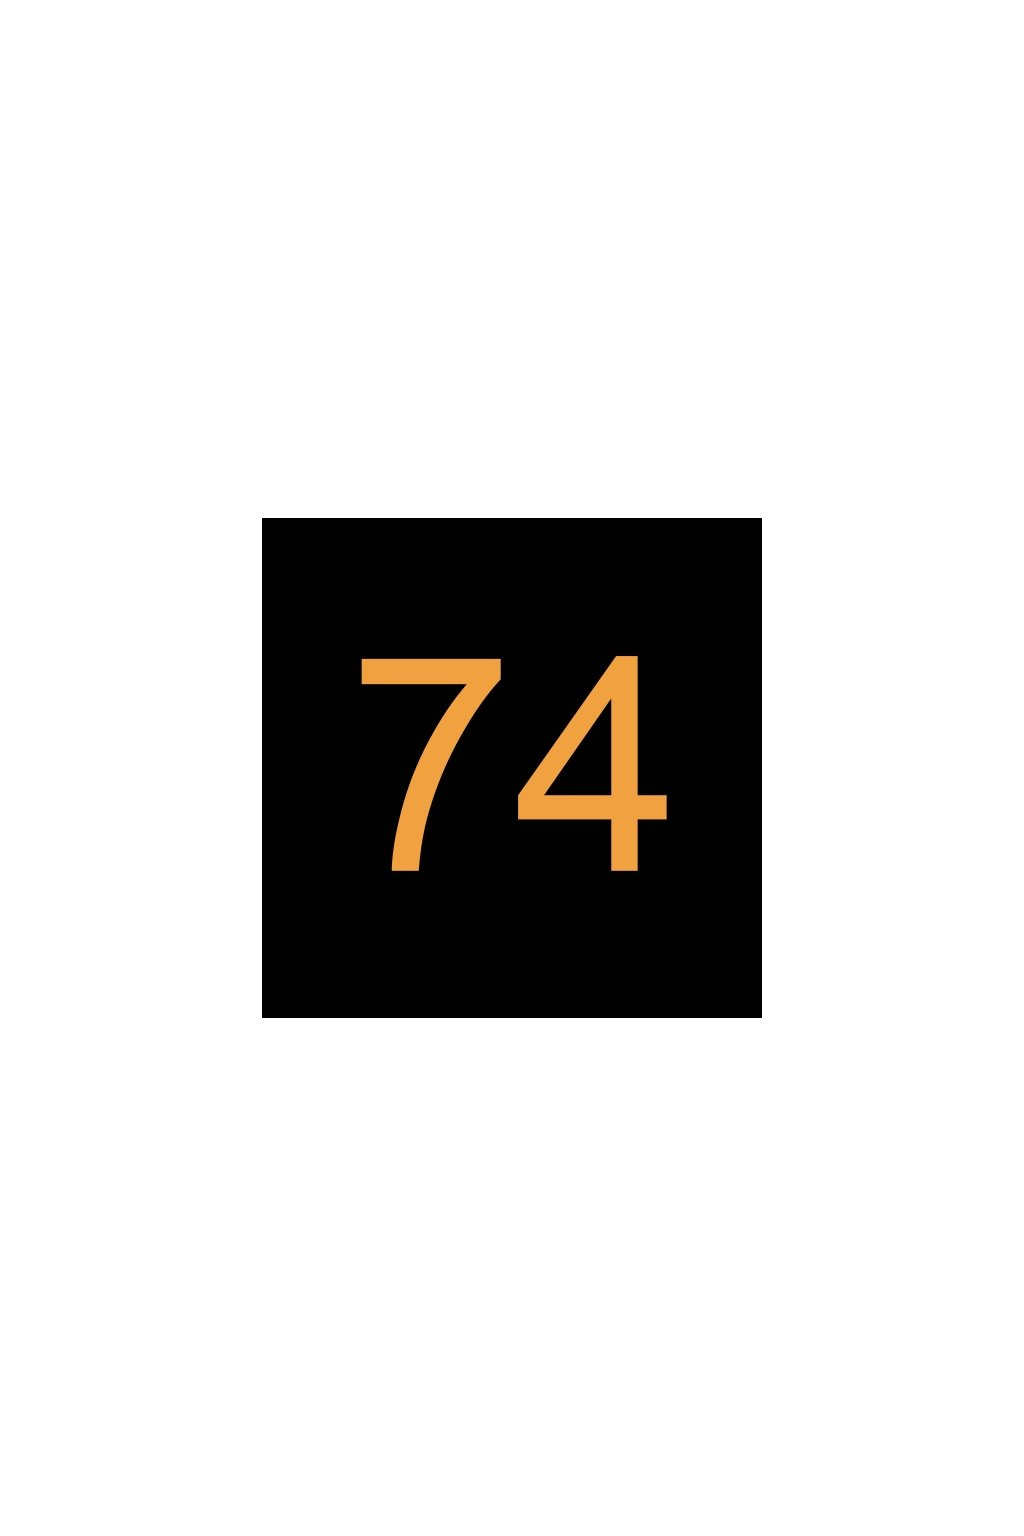 N293999 ELEKTRONIKA A SPÍNAČ 74